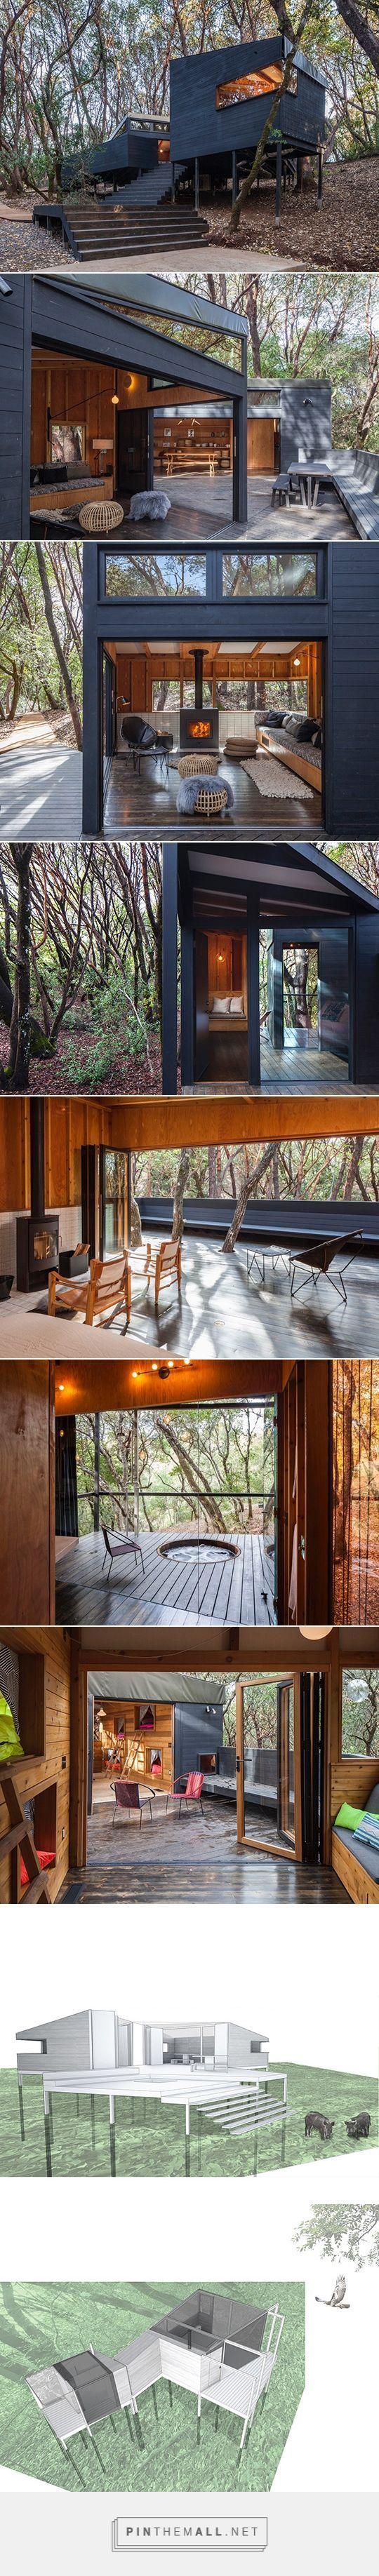 Casa pequeña en el bosque-  via https://pinthemall.net